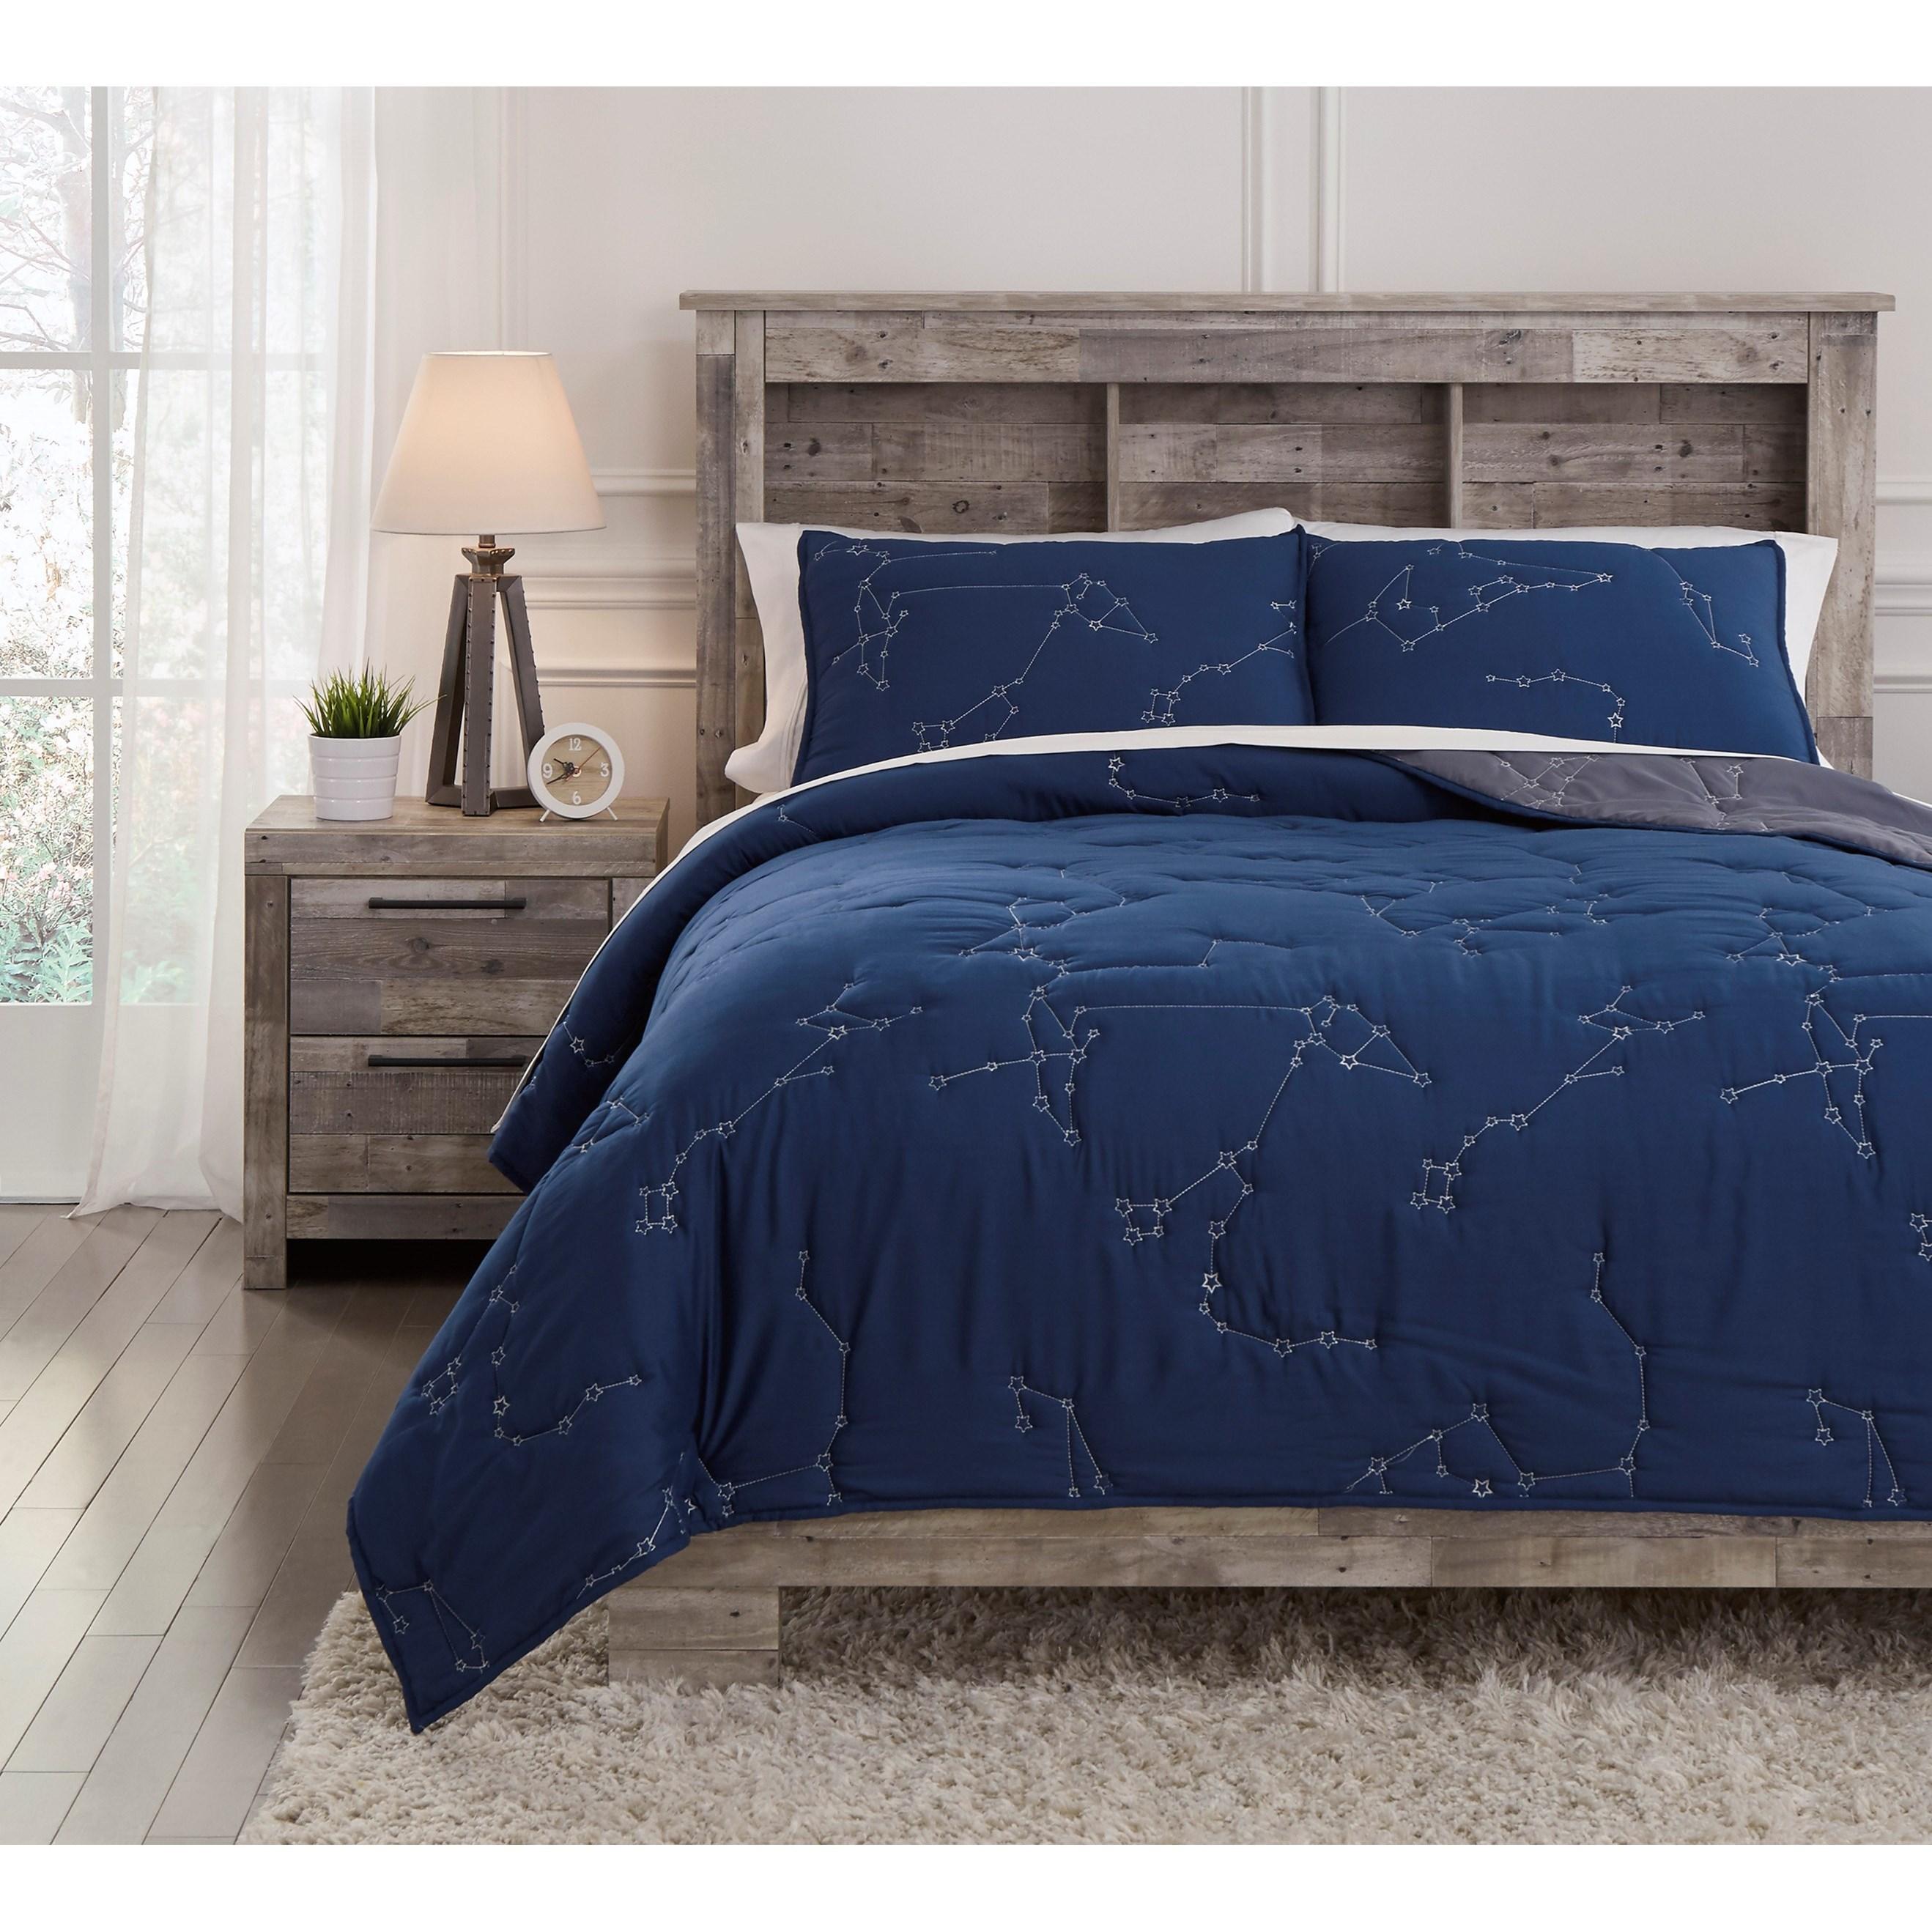 Bedding Sets Ekin Full Navy/Gray Quilt Set by Ashley (Signature Design) at Johnny Janosik